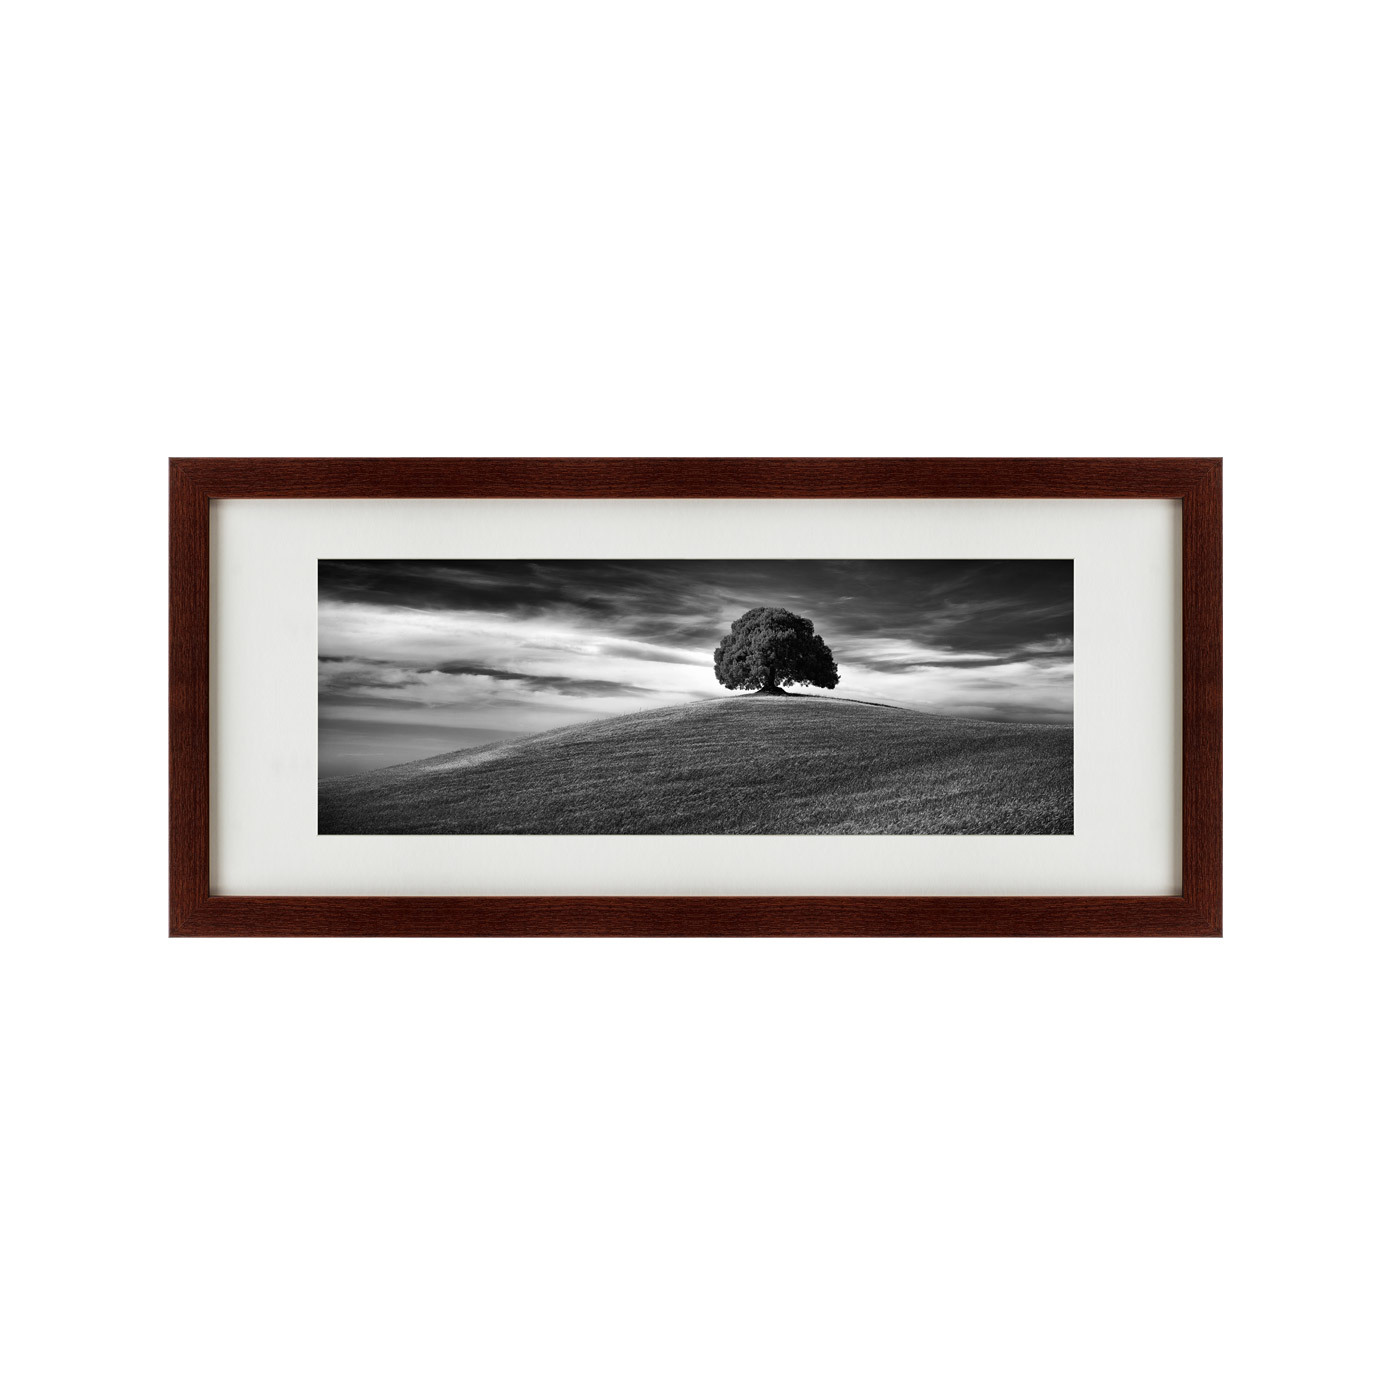 {} Картины в Квартиру Картина Дерево На Холме (35х77 см) картины в квартиру картина над горами 35х77 см